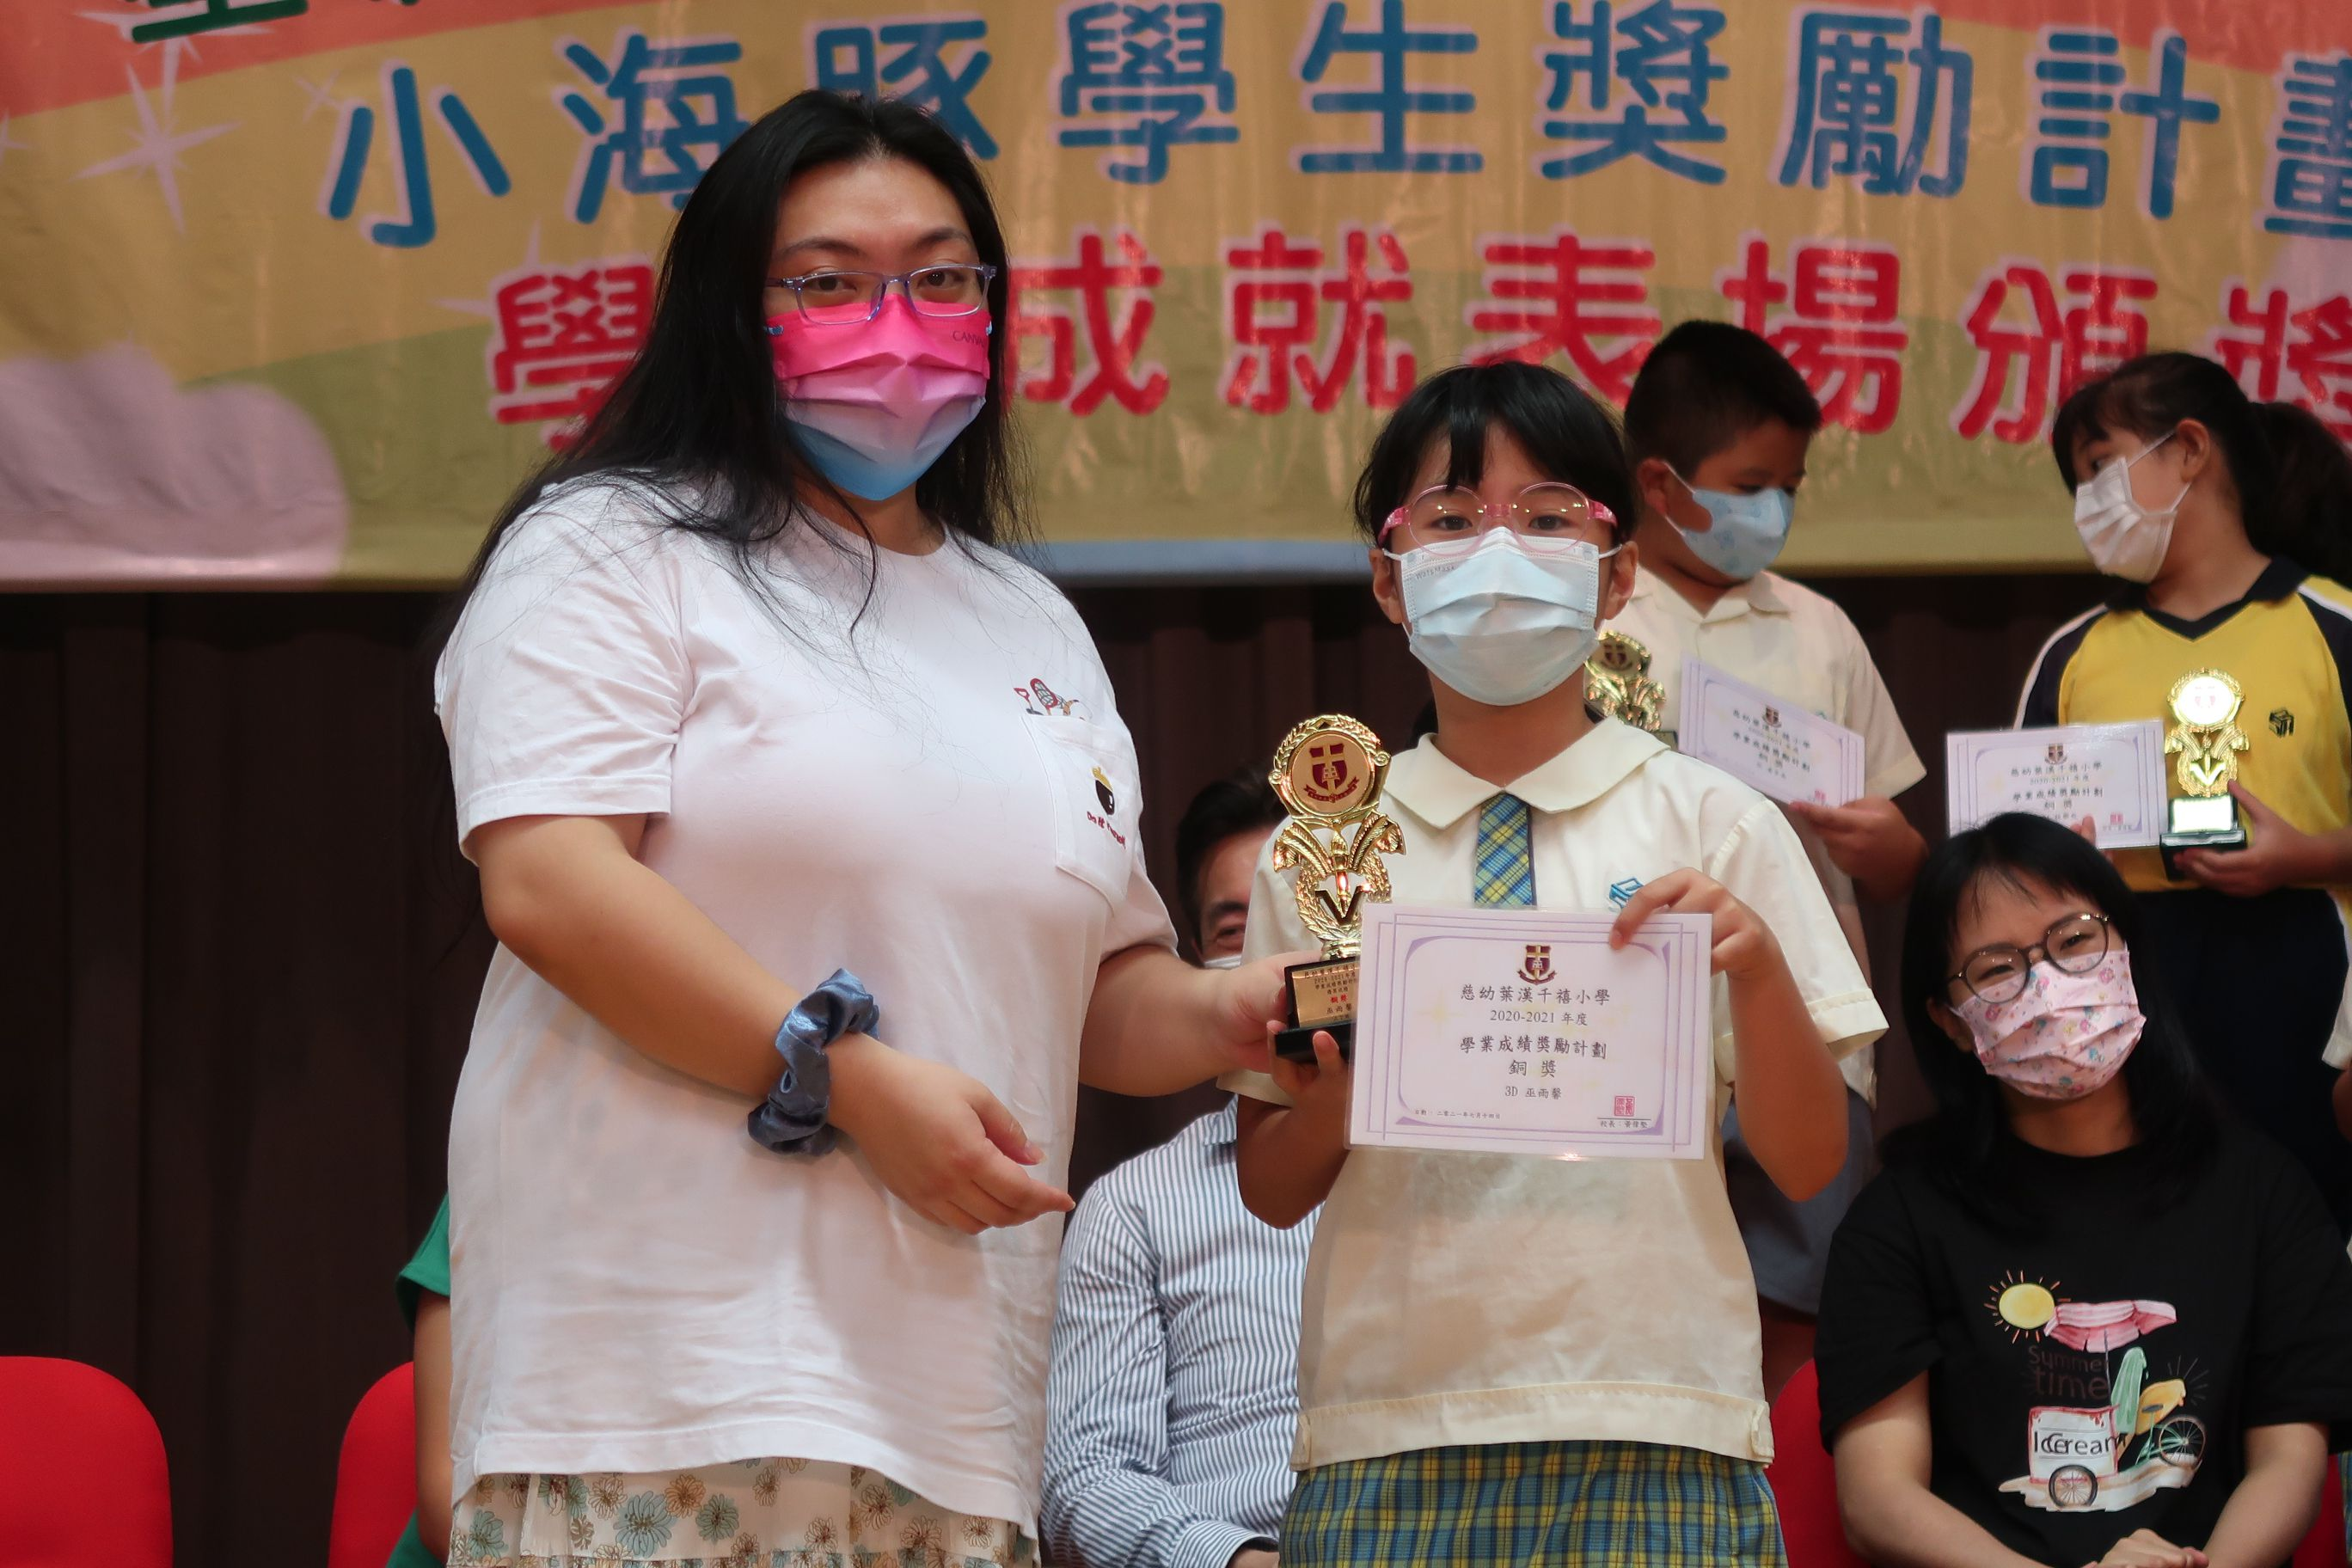 https://syh.edu.hk/sites/default/files/img_5578.jpg